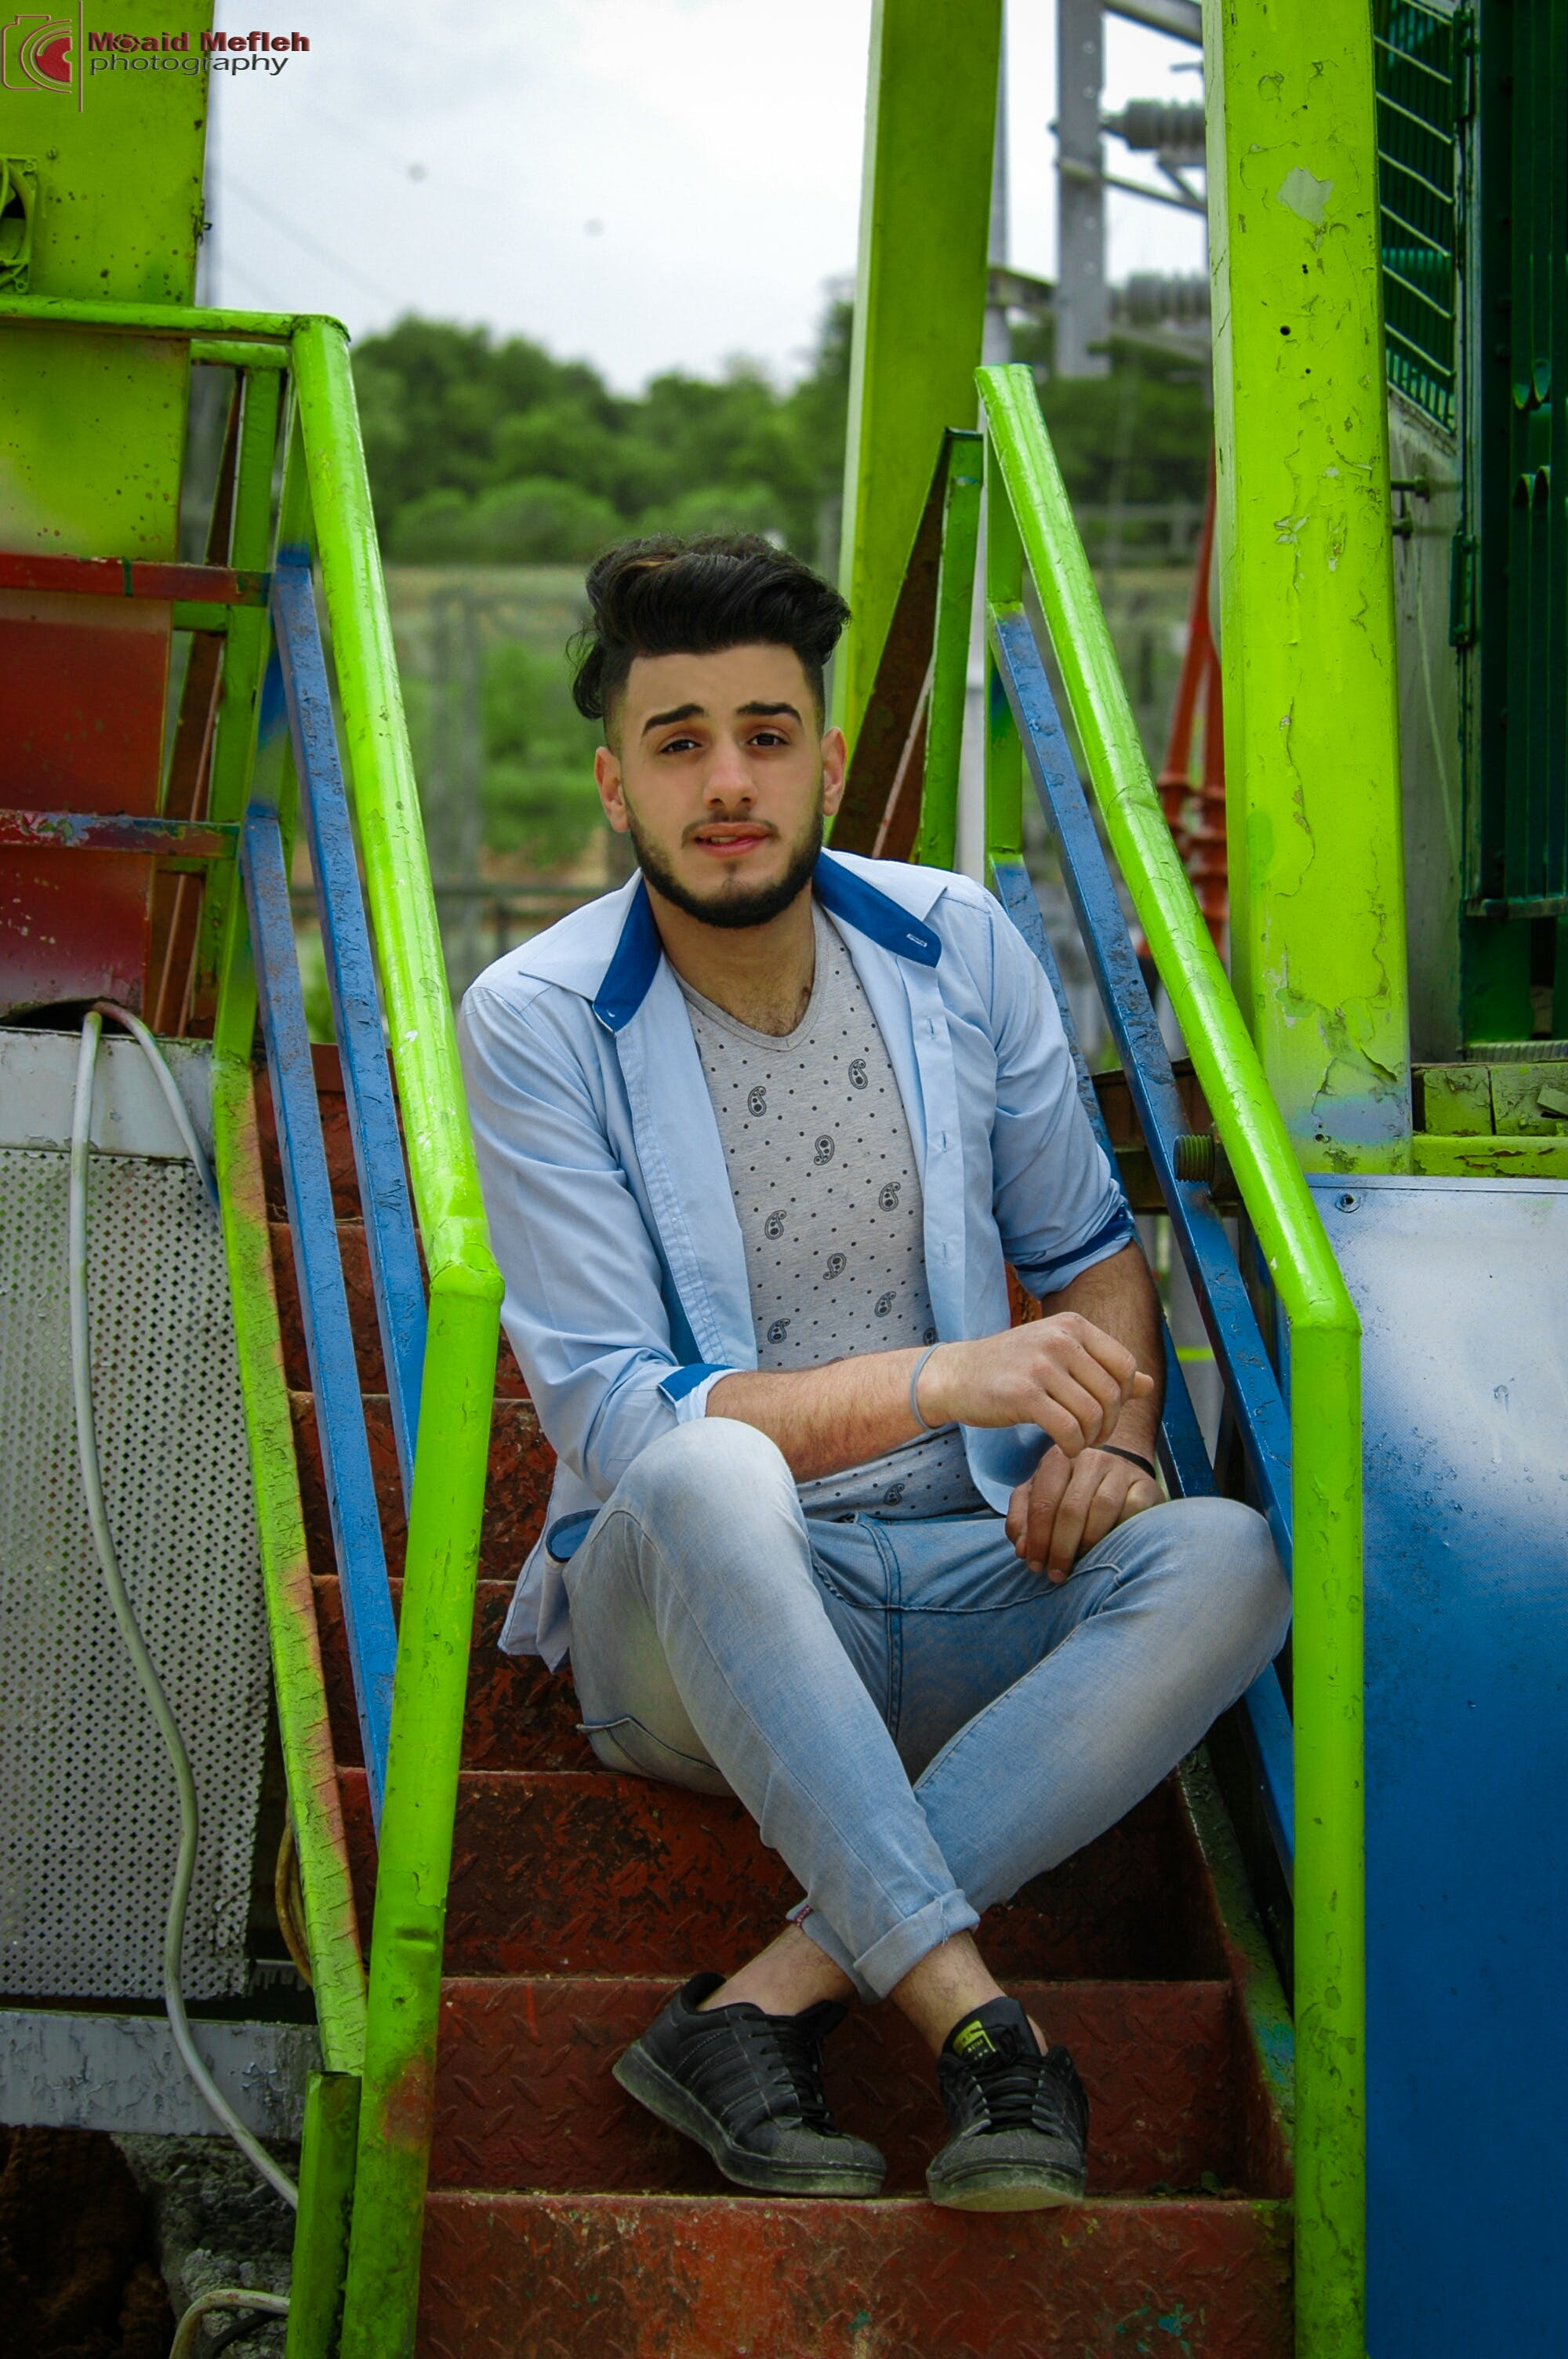 Man Wears Blue Dress Shirt Sitting on the Stair